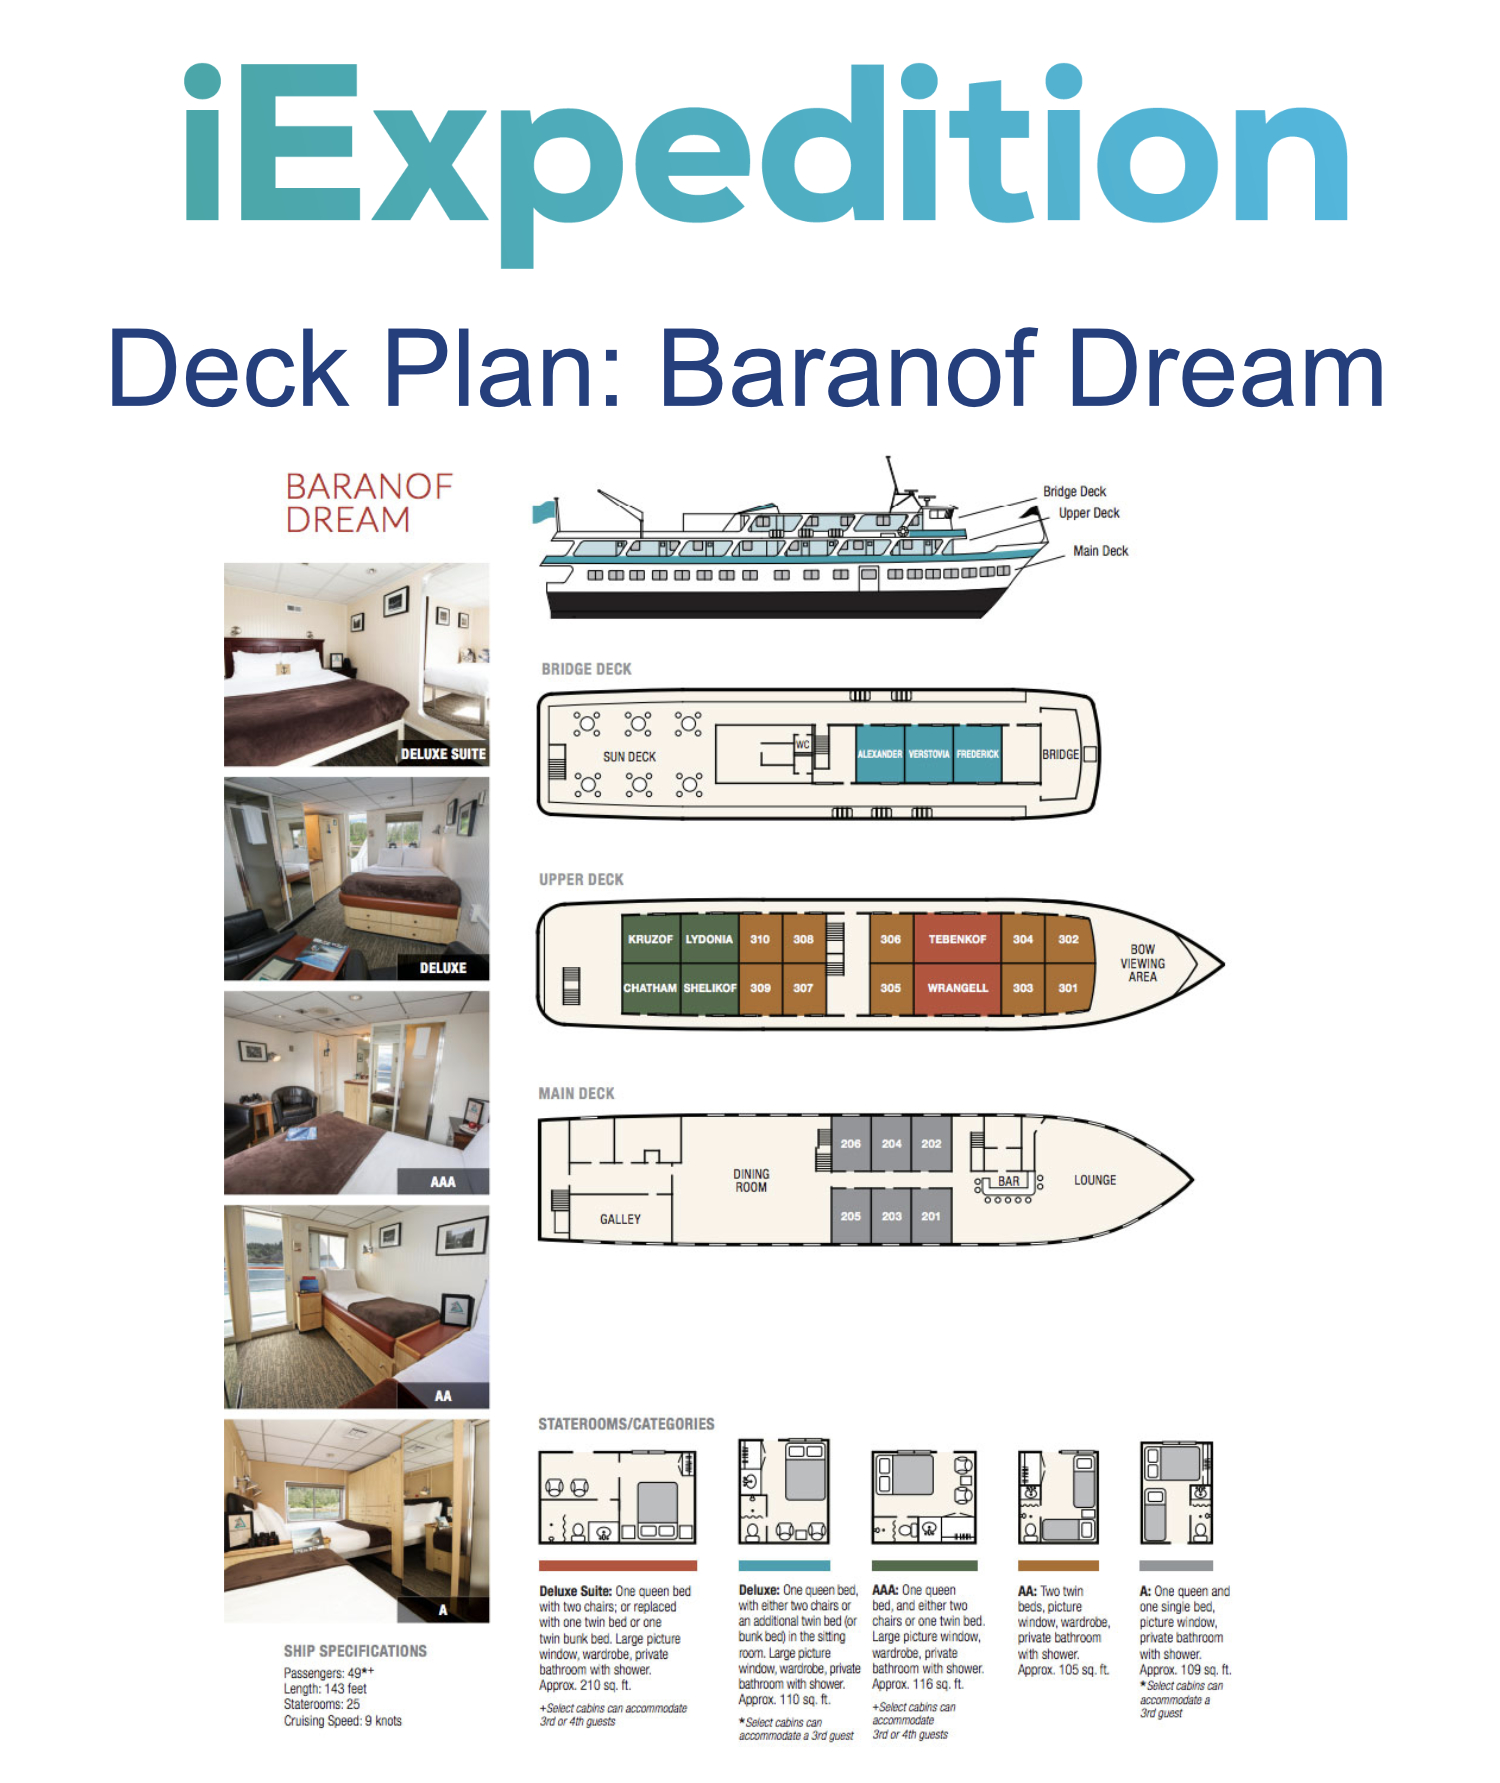 Baranof dream deck plan